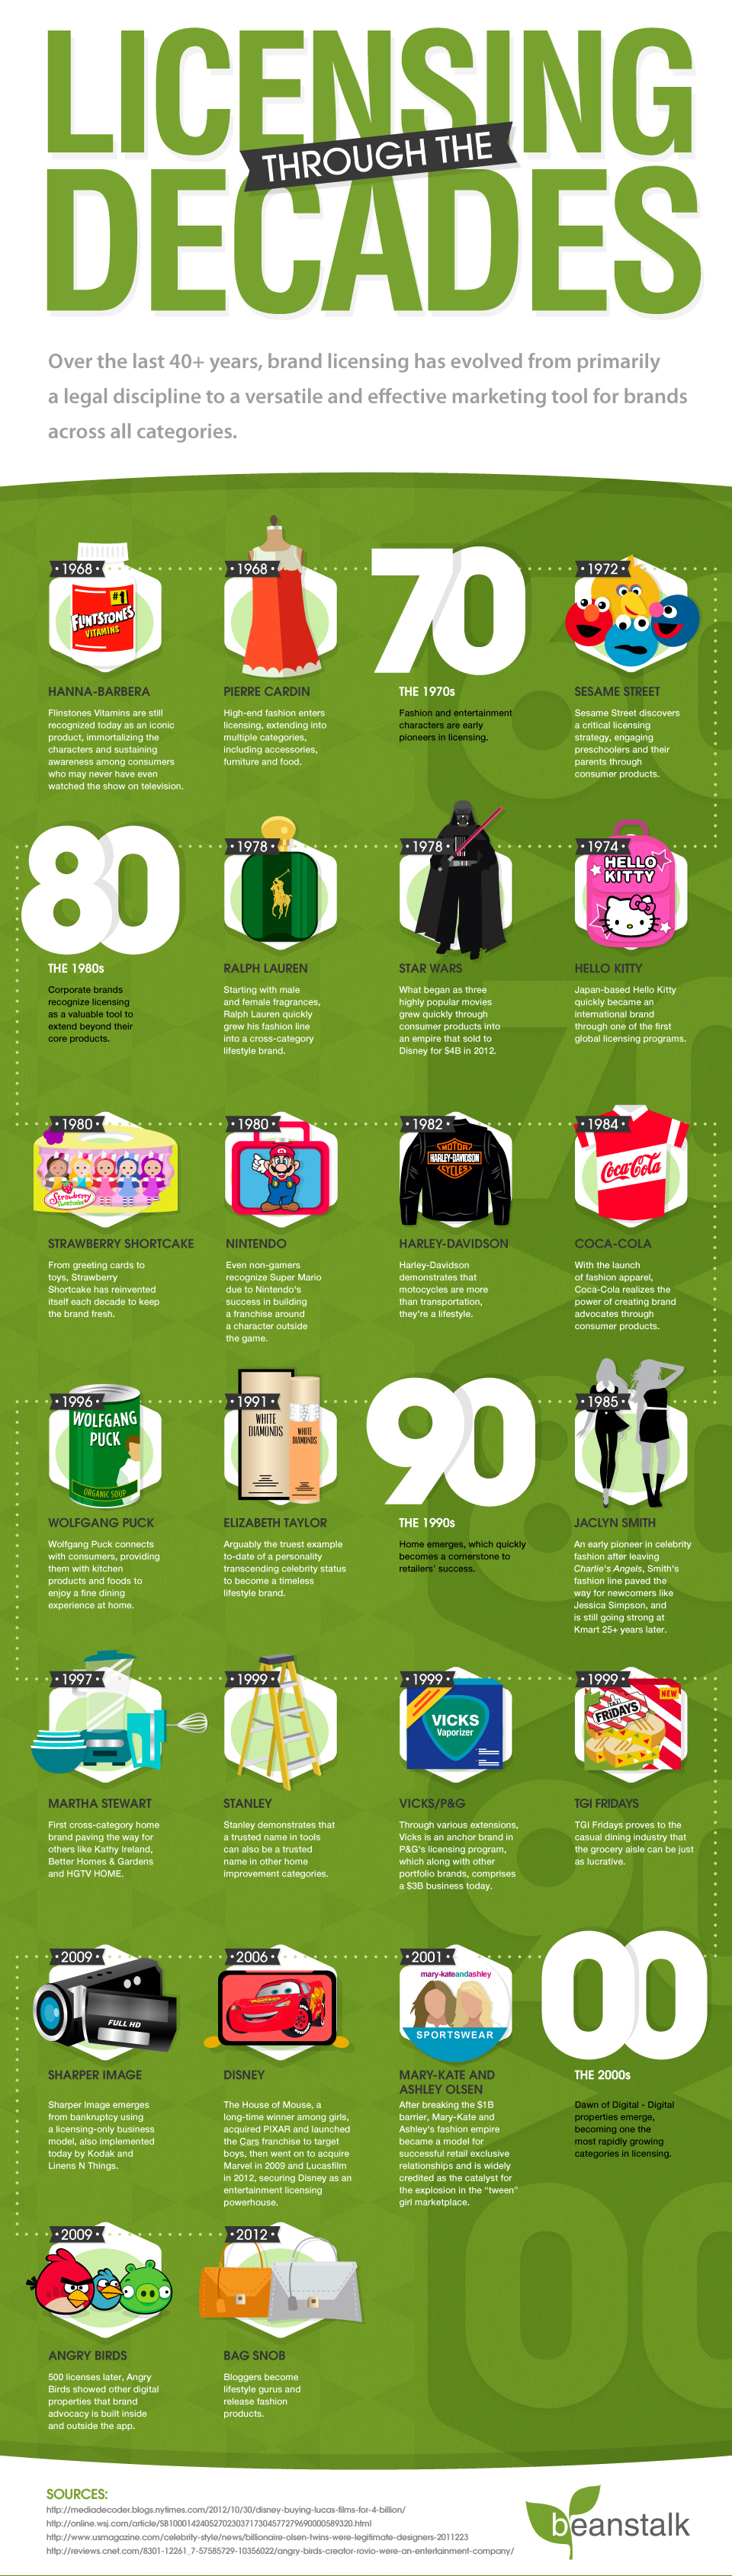 Licensing beanstalk infographic